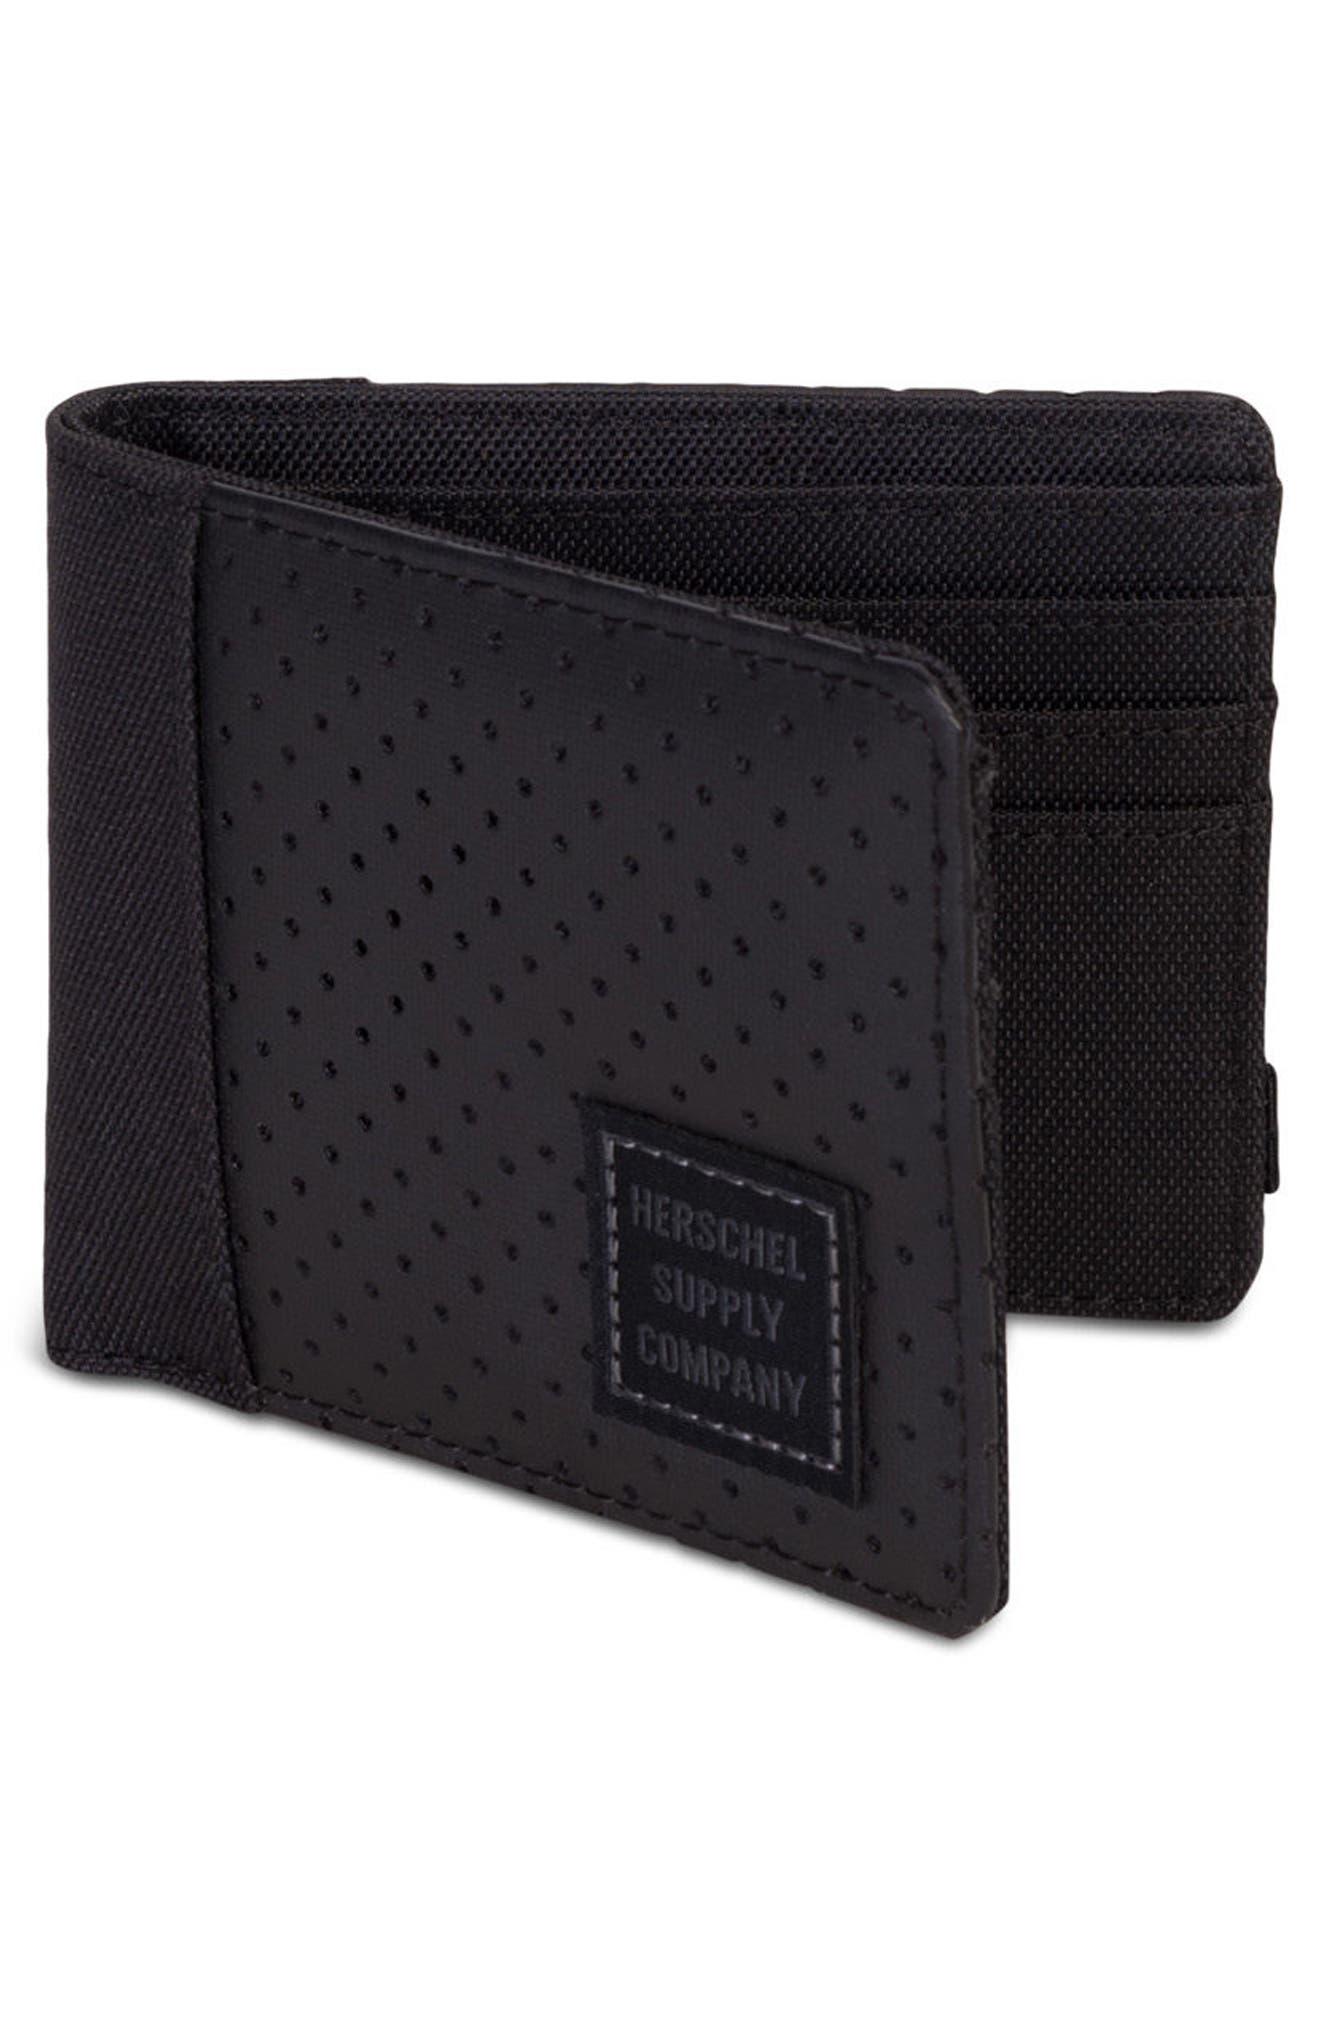 Edward Aspect Perforated Wallet,                             Alternate thumbnail 3, color,                             Black